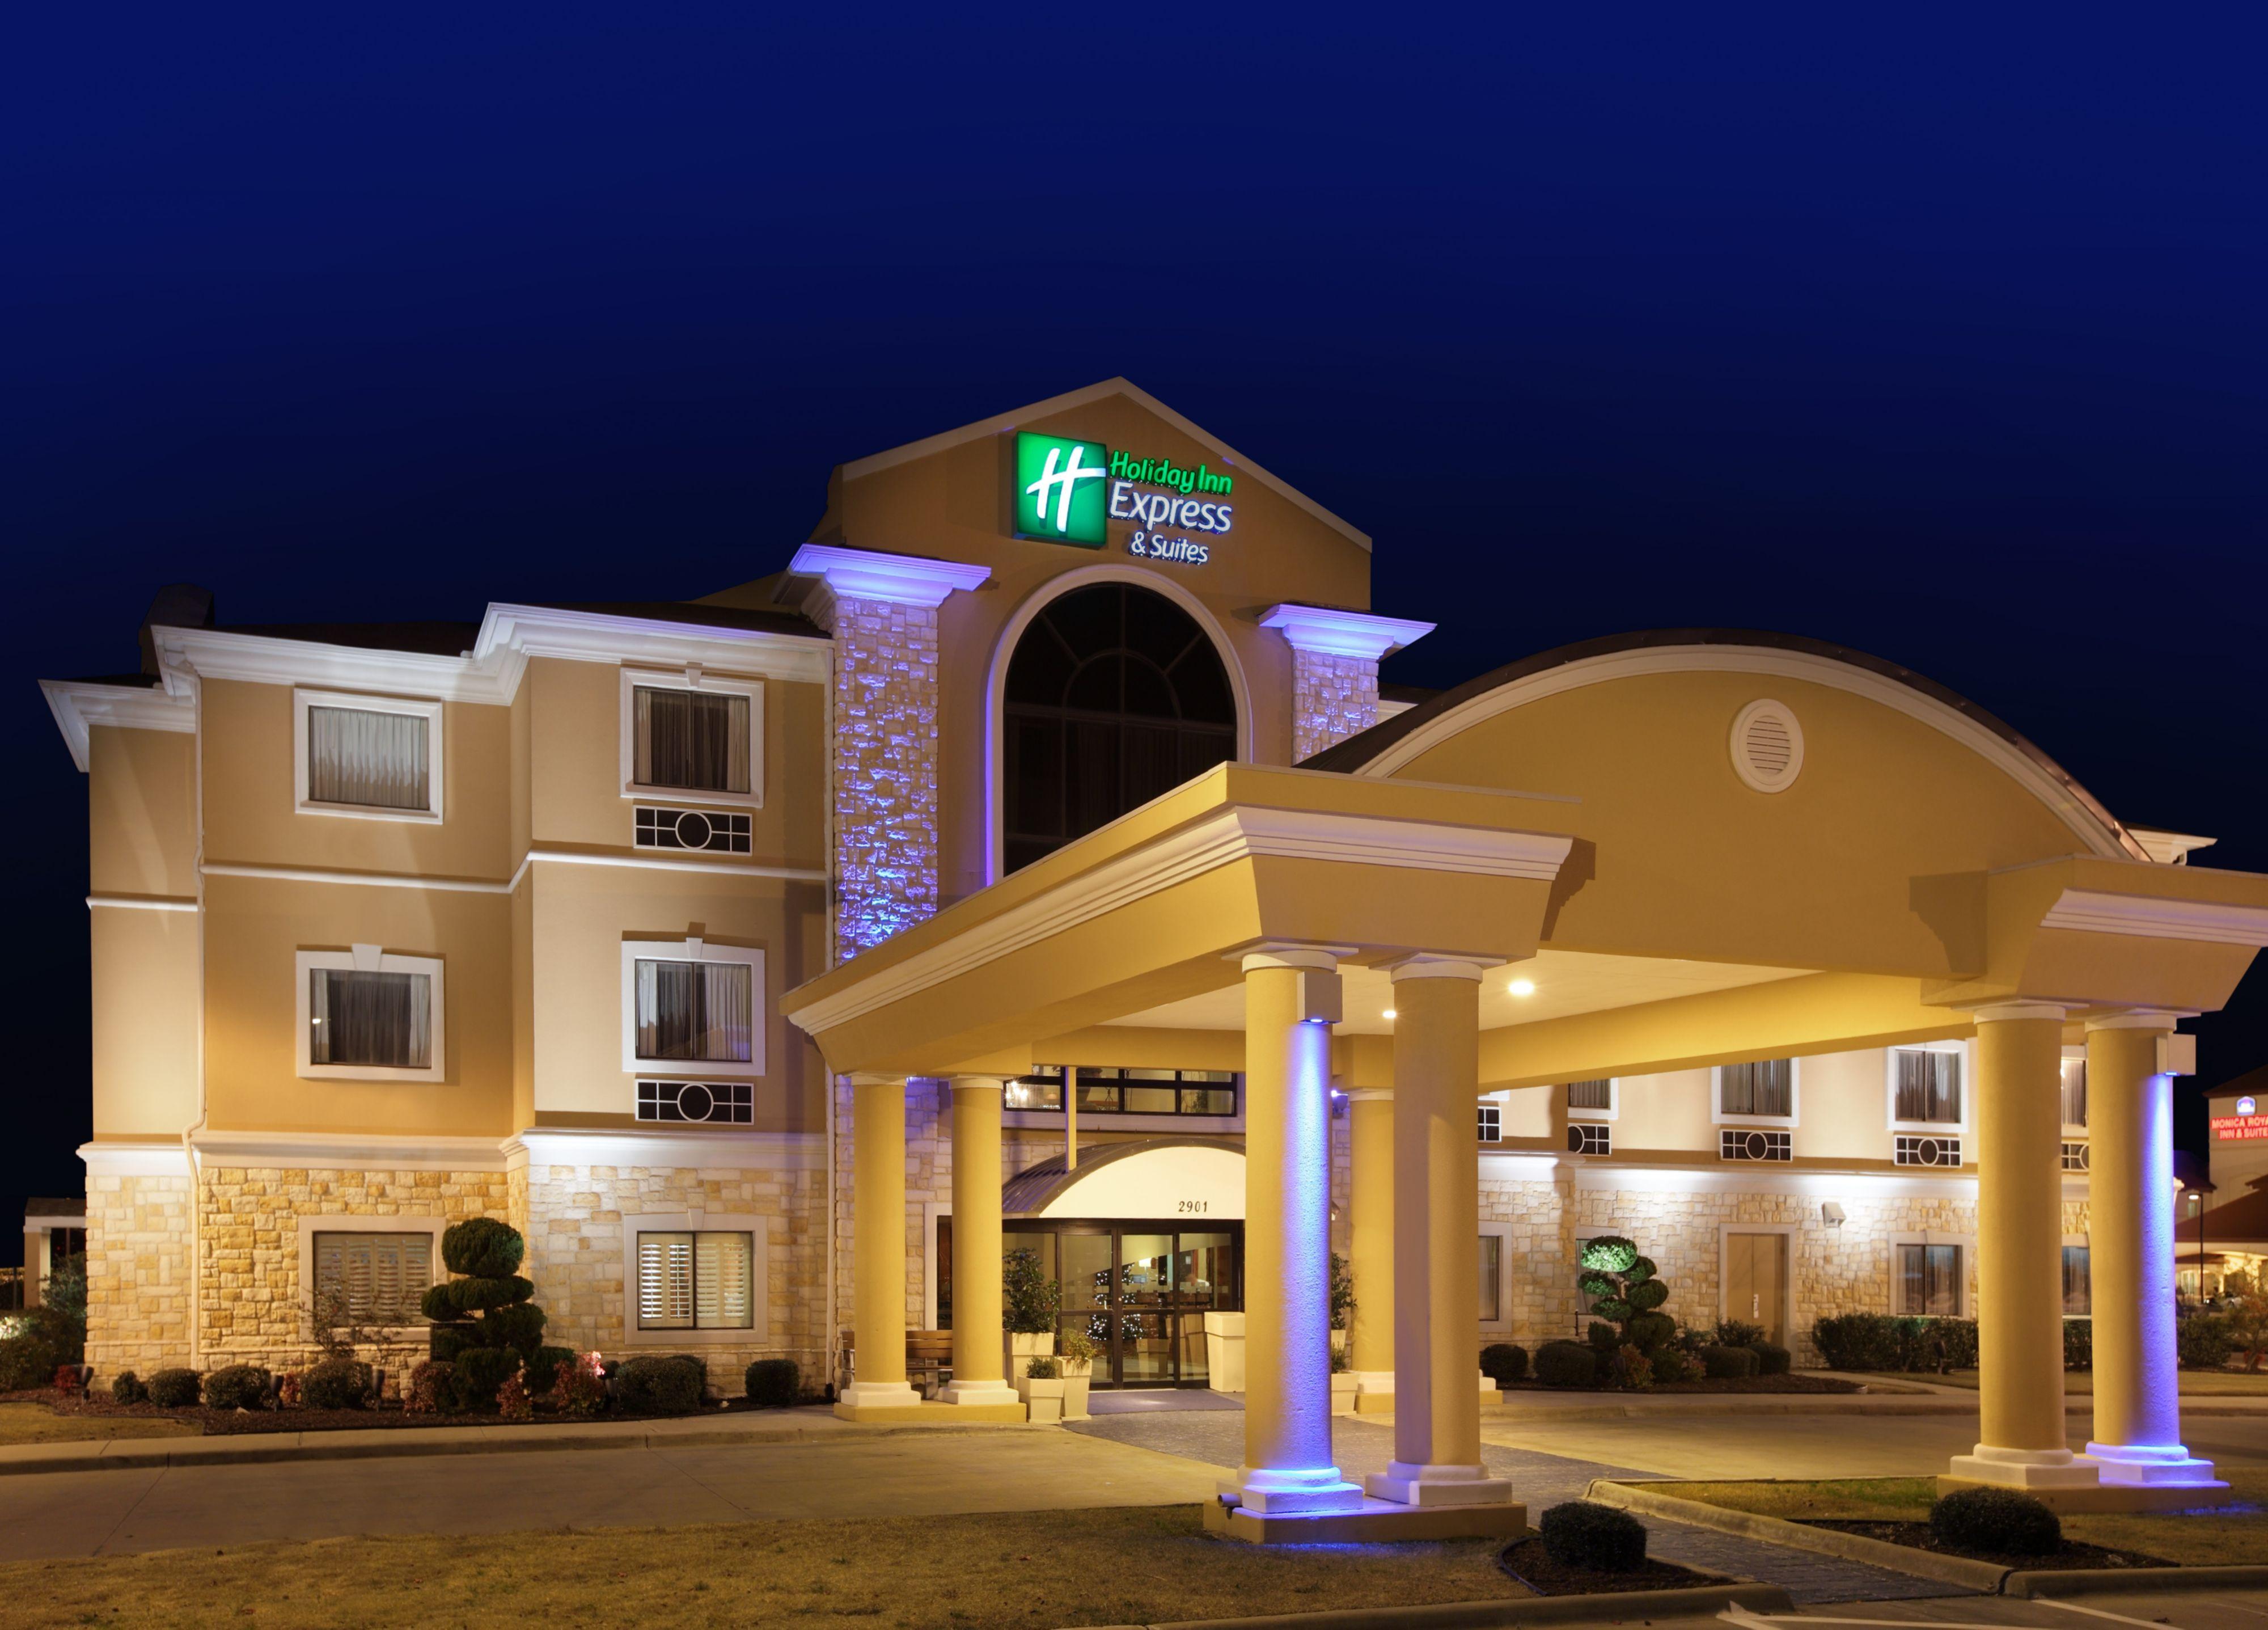 Holiday Inn Express & Suites Greensburg image 0